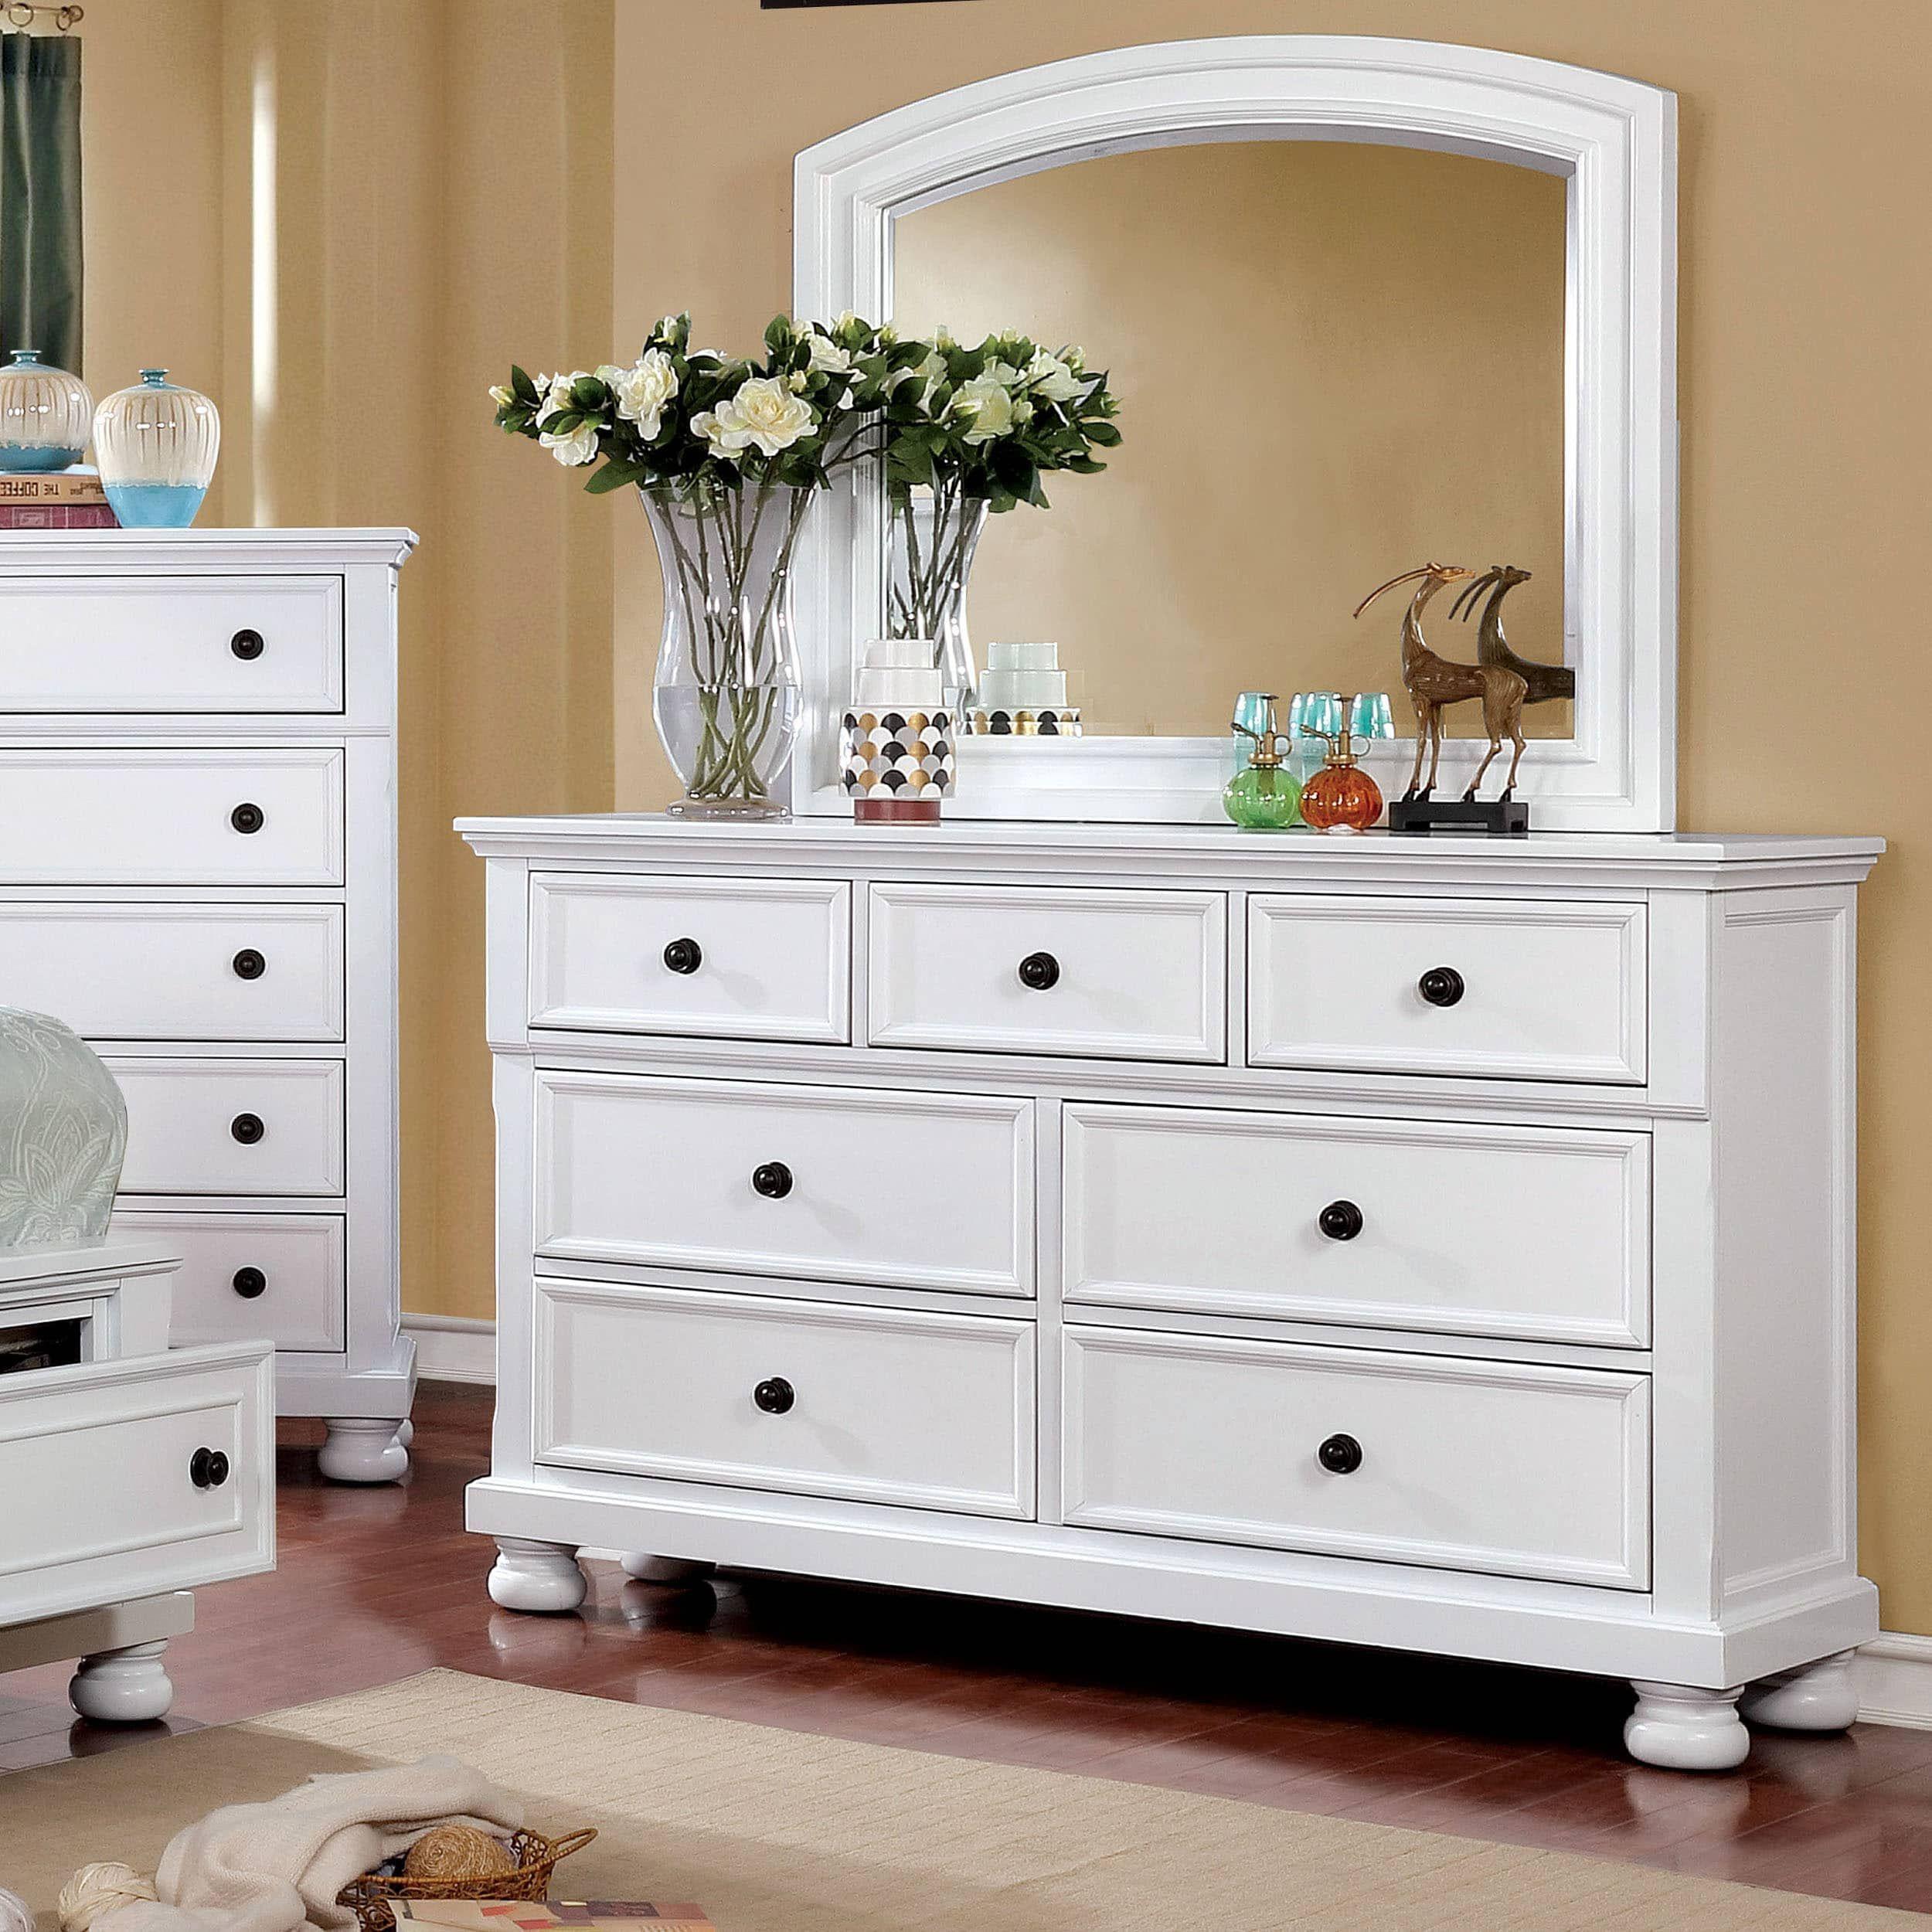 Furniture of america verona traditional 2 piece dresser and mirror set white